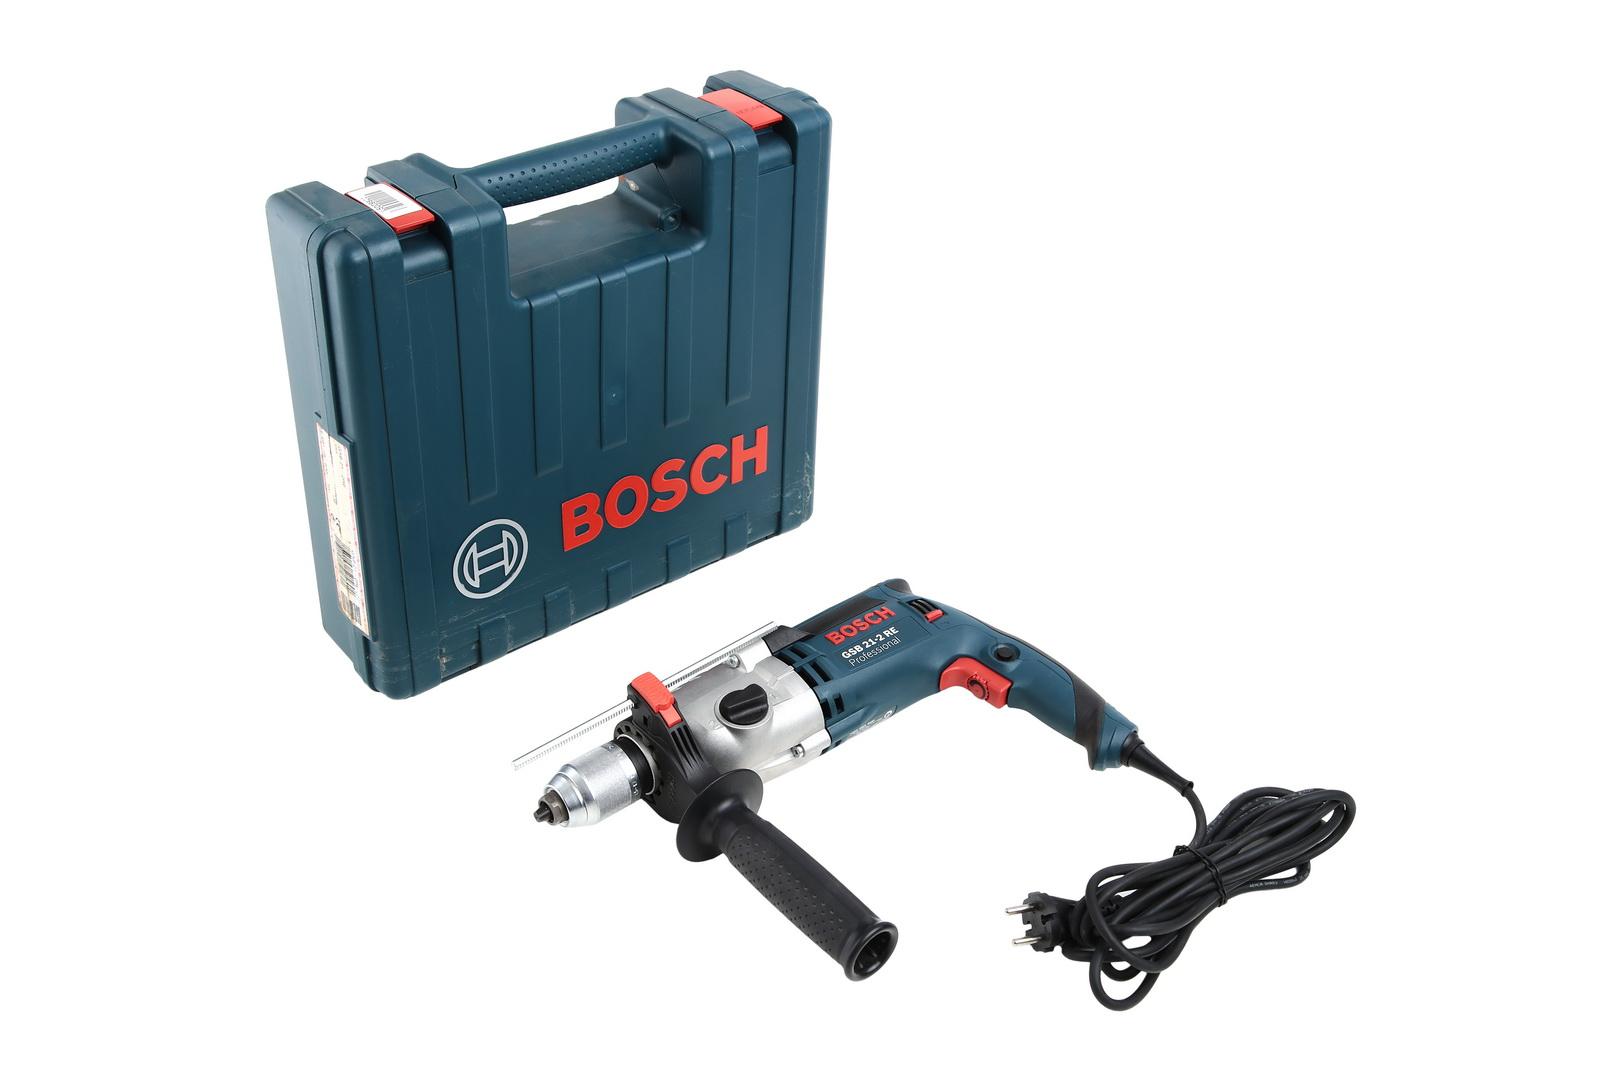 Дрель ударная Bosch Gsb 21-2 re (0.601.19c.500)